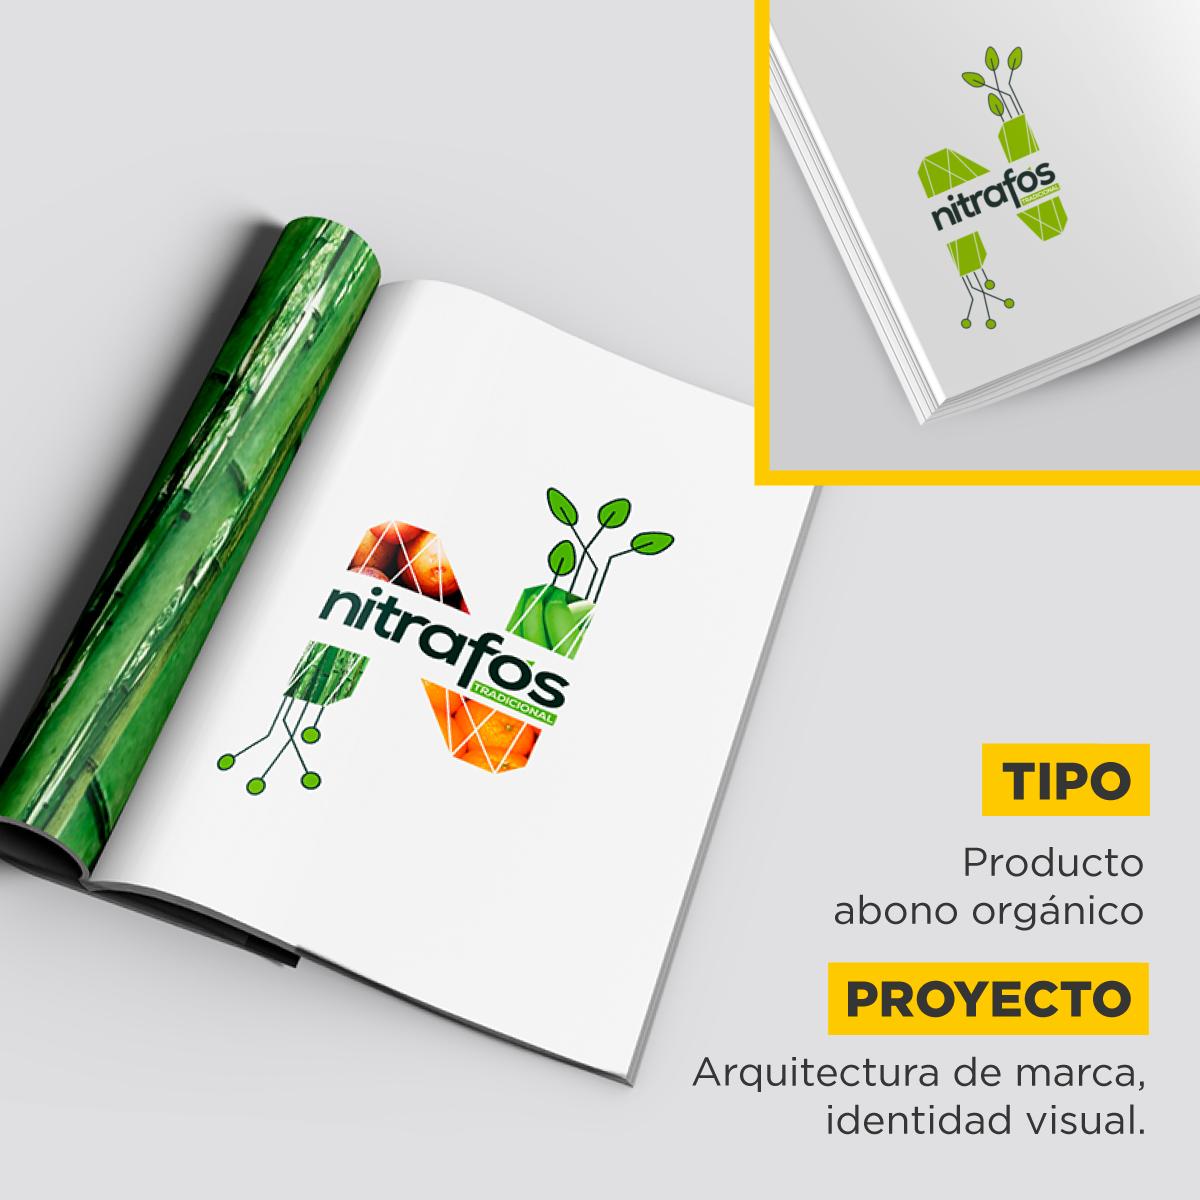 imagen+agro333.png